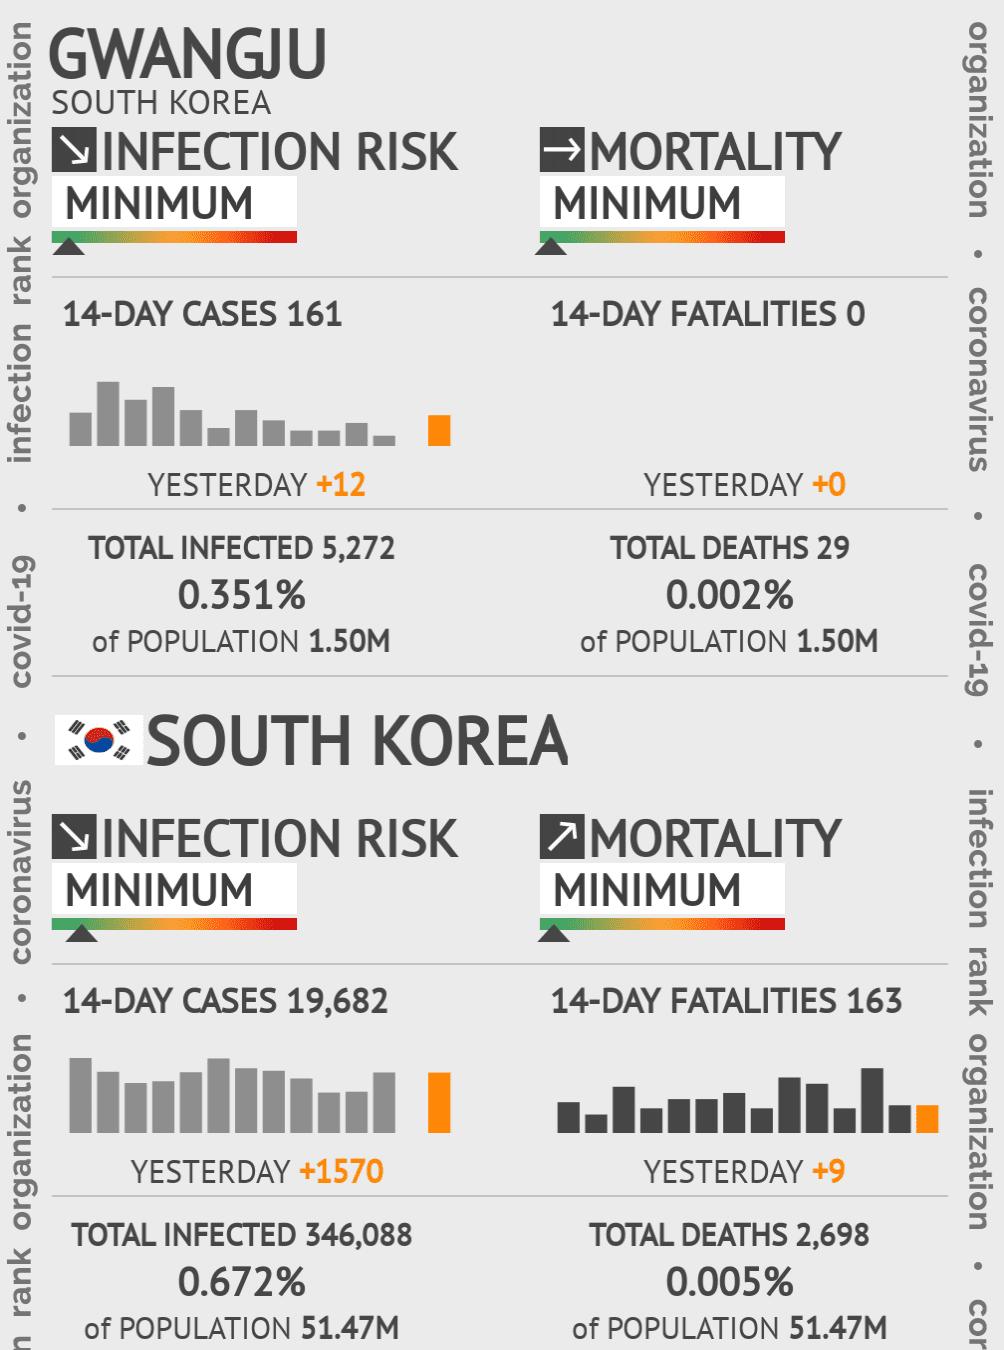 Gwangju Coronavirus Covid-19 Risk of Infection on March 04, 2021